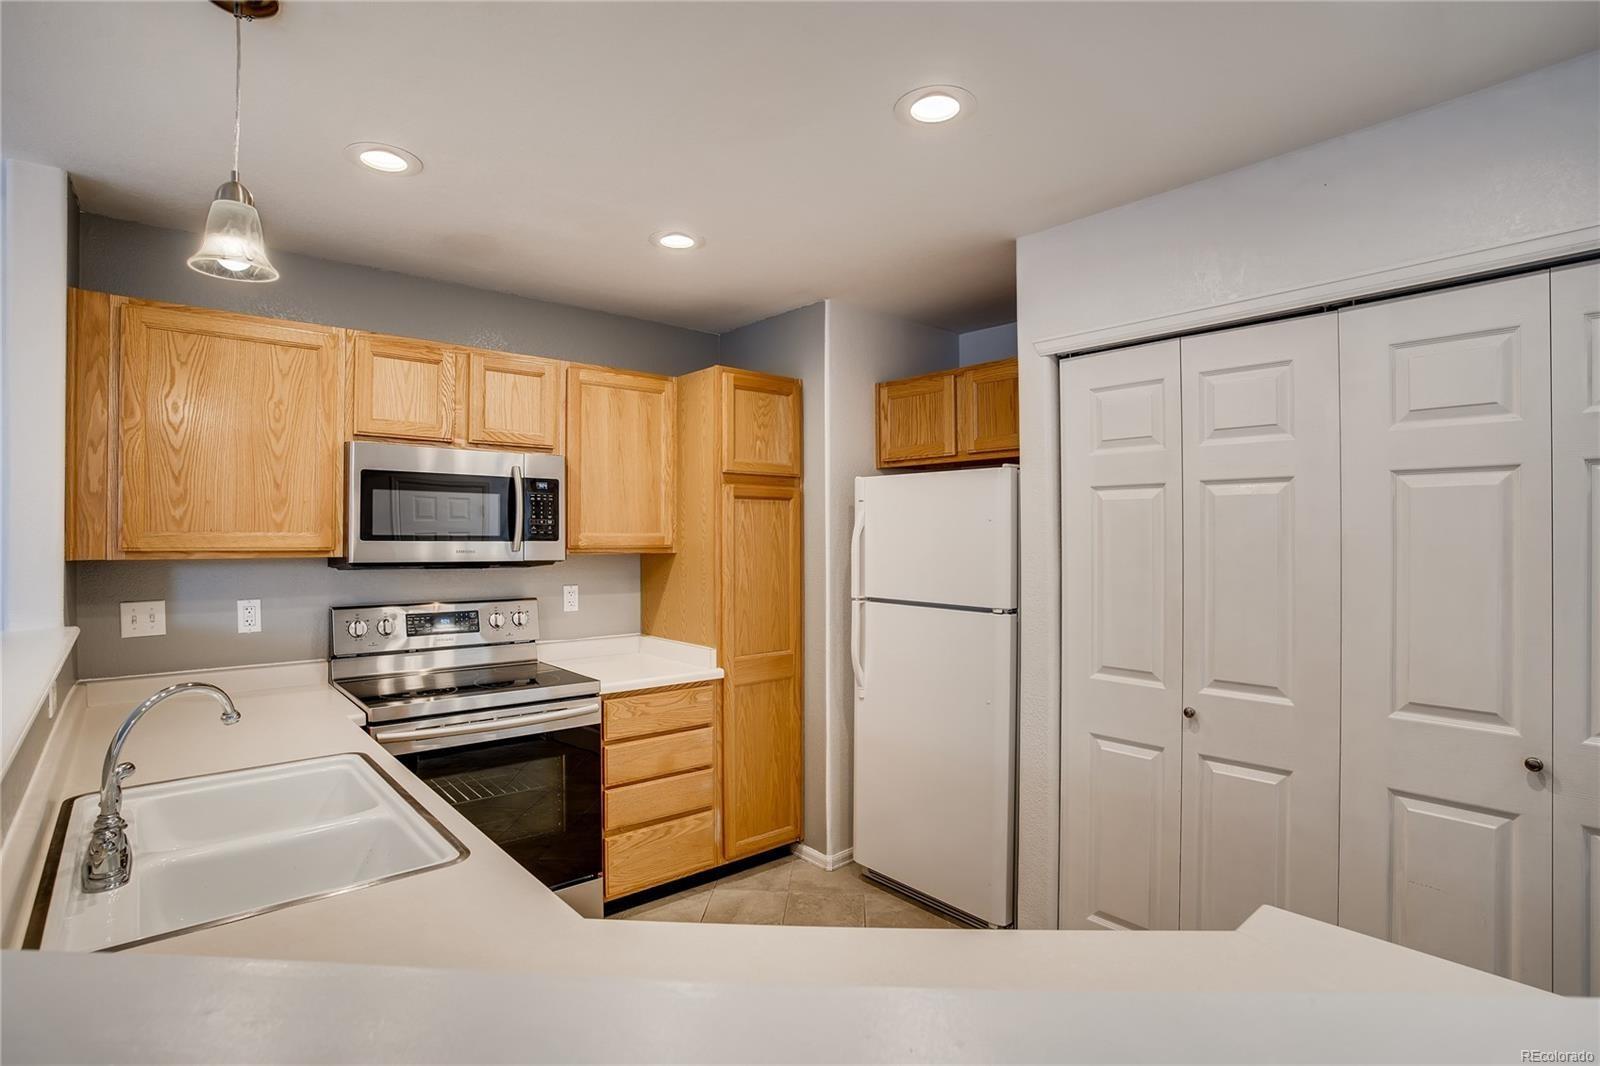 MLS# 3654588 - 6 - 2085 E 103rd Avenue, Thornton, CO 80229